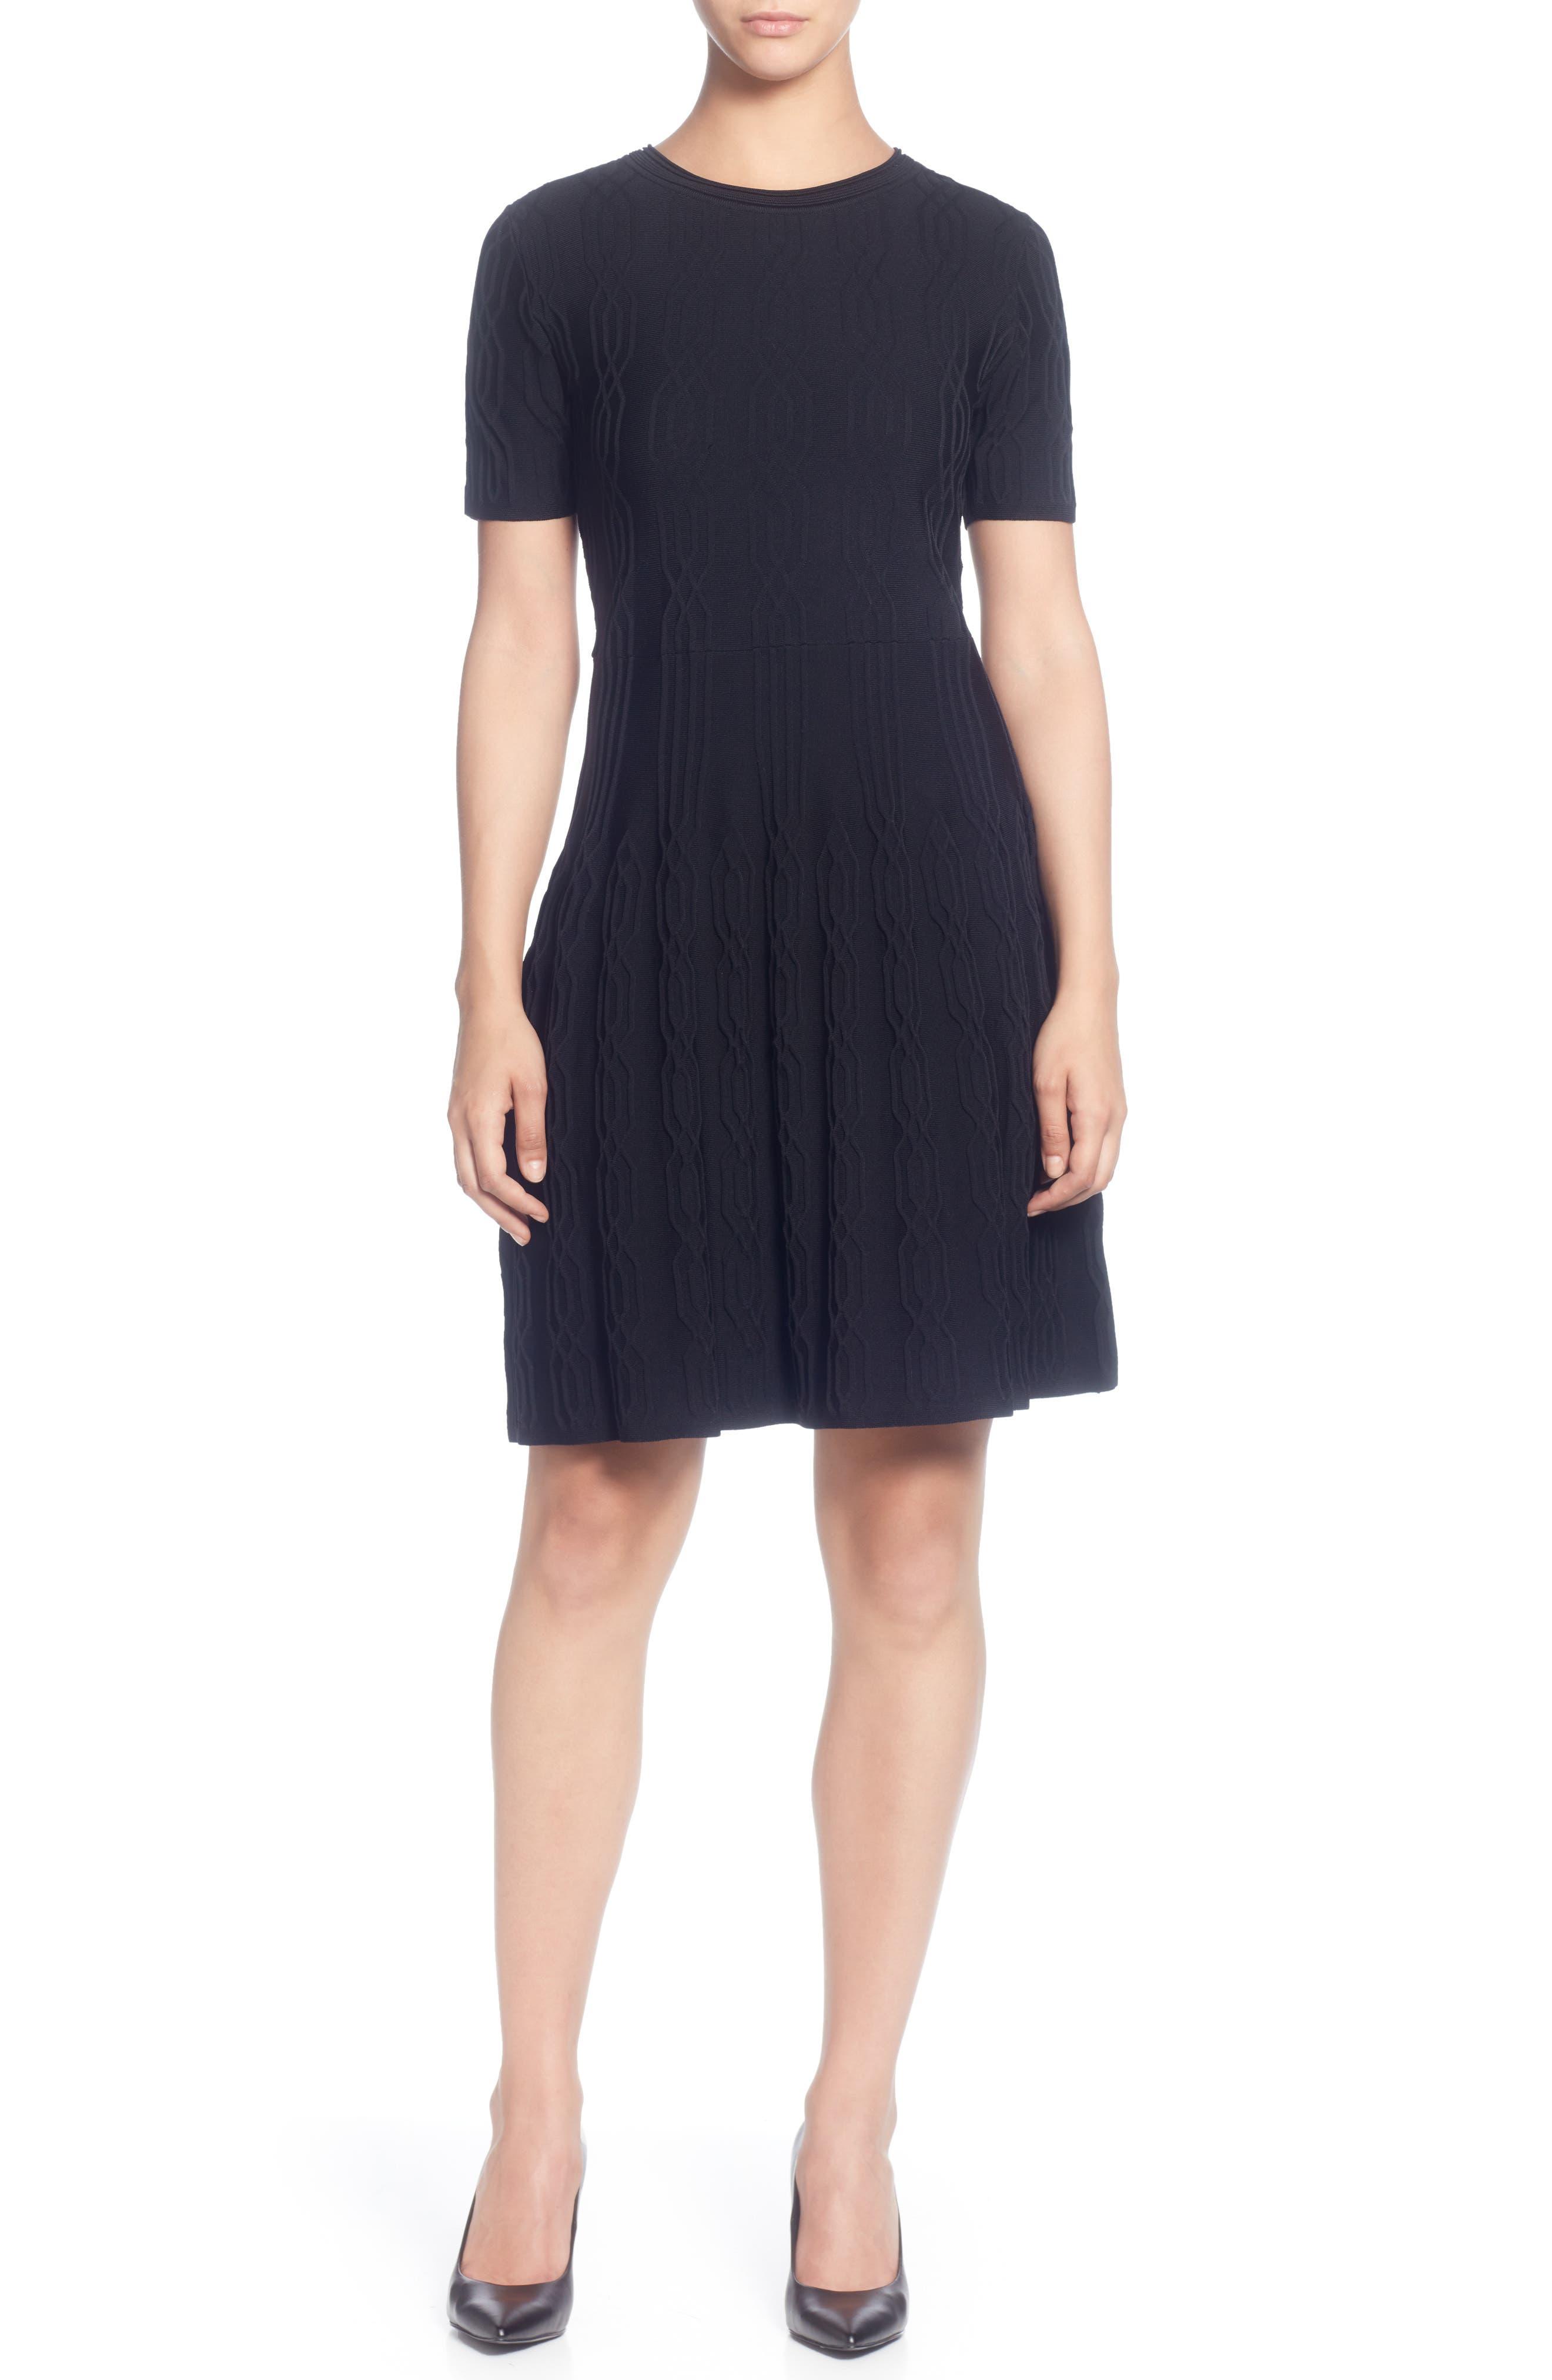 Catherine Catherine Malandrino Jacquard Sweater Dress, Black